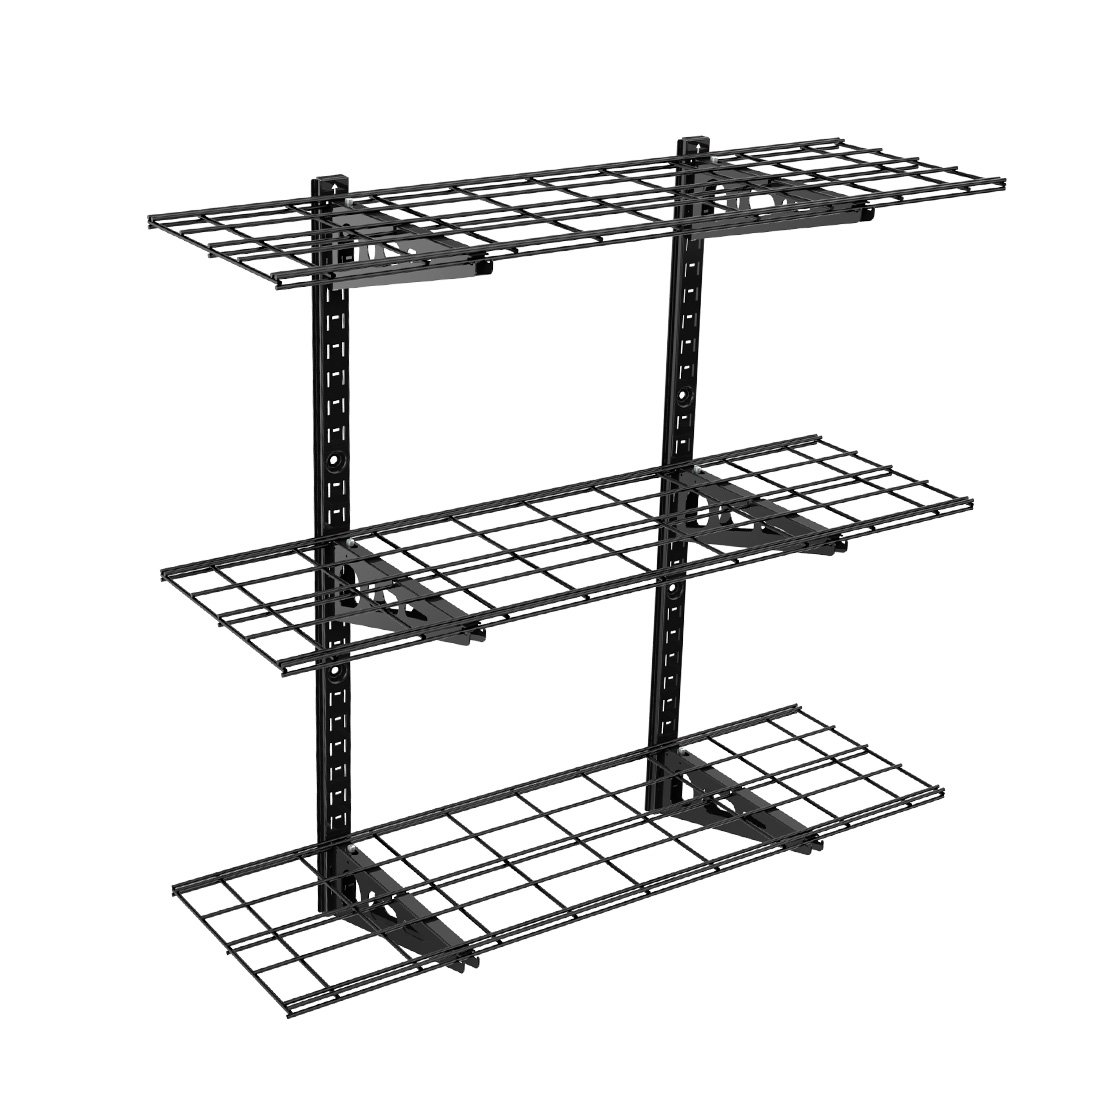 buy fleximounts universal tv cart vertically adjustable w dvd shelf Sony Trinitron 36 Inch fleximounts 3 tier storage wall shelves 1x3ft 12 inch by 36